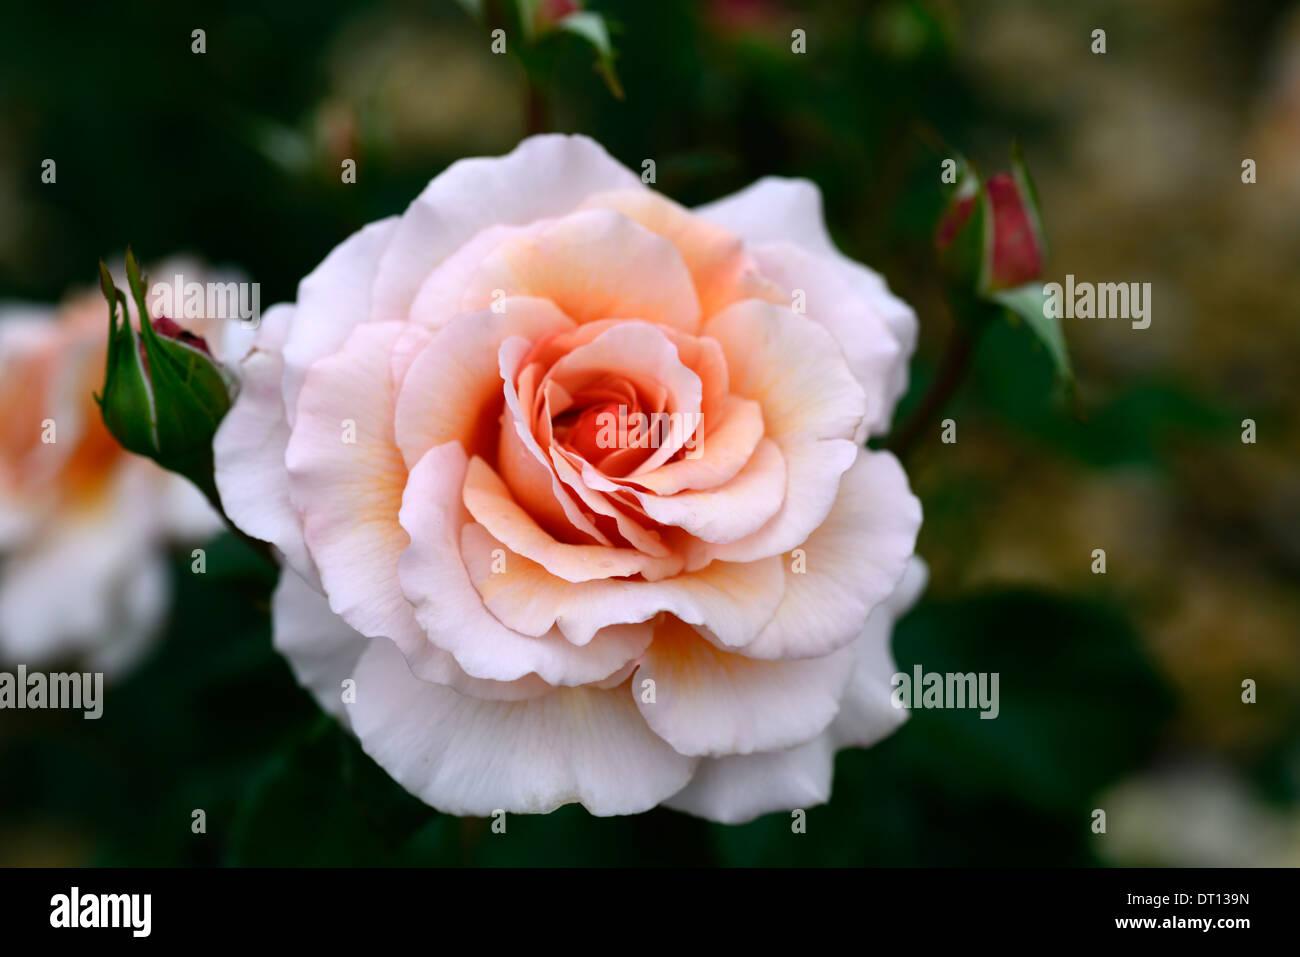 rosa great expectations mackalves rose roses It's Magic floribunda coral pink flowers flower flowering bloom blooming - Stock Image